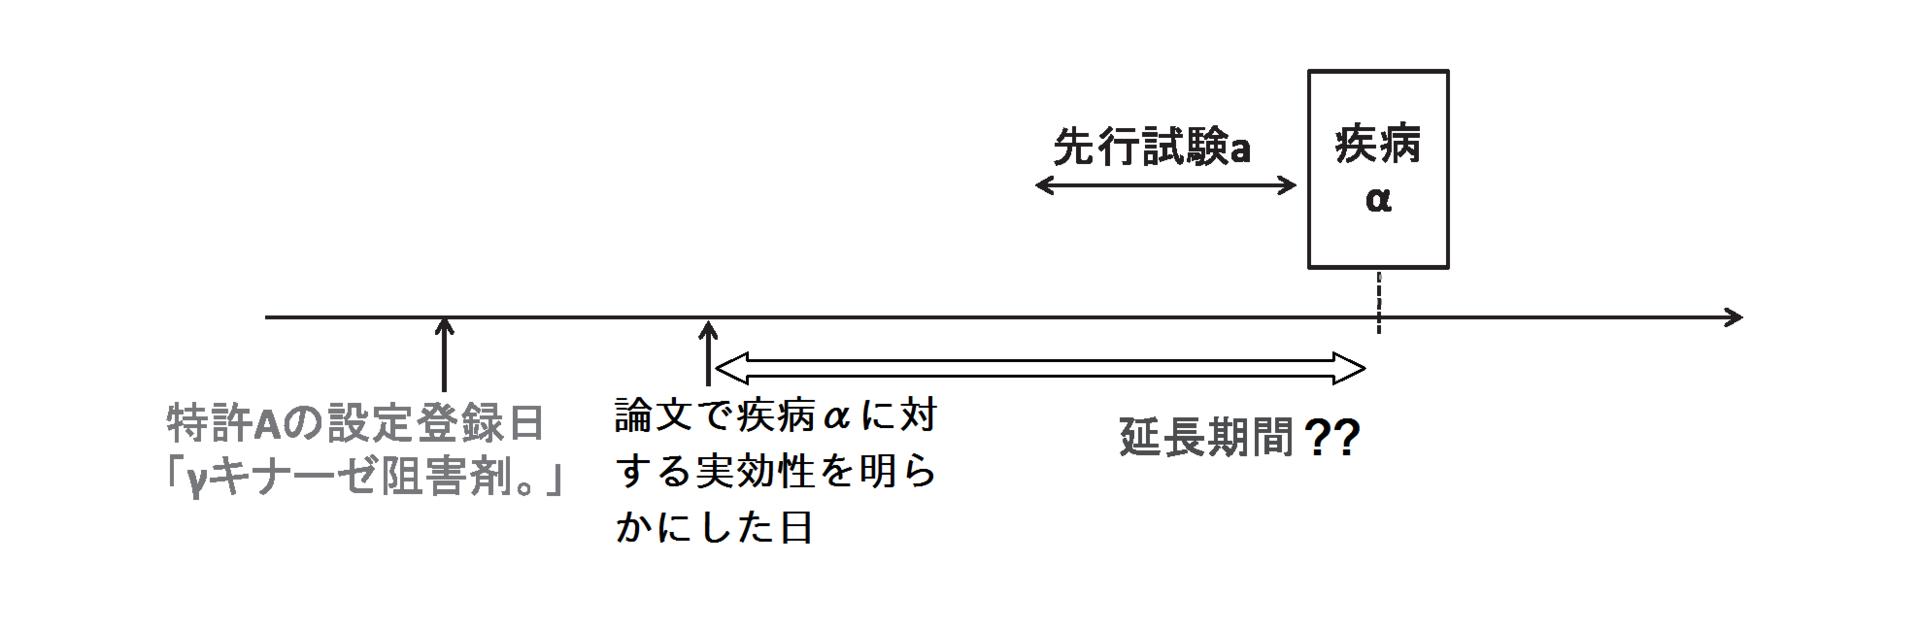 2020shimizu_fig20r改01.png